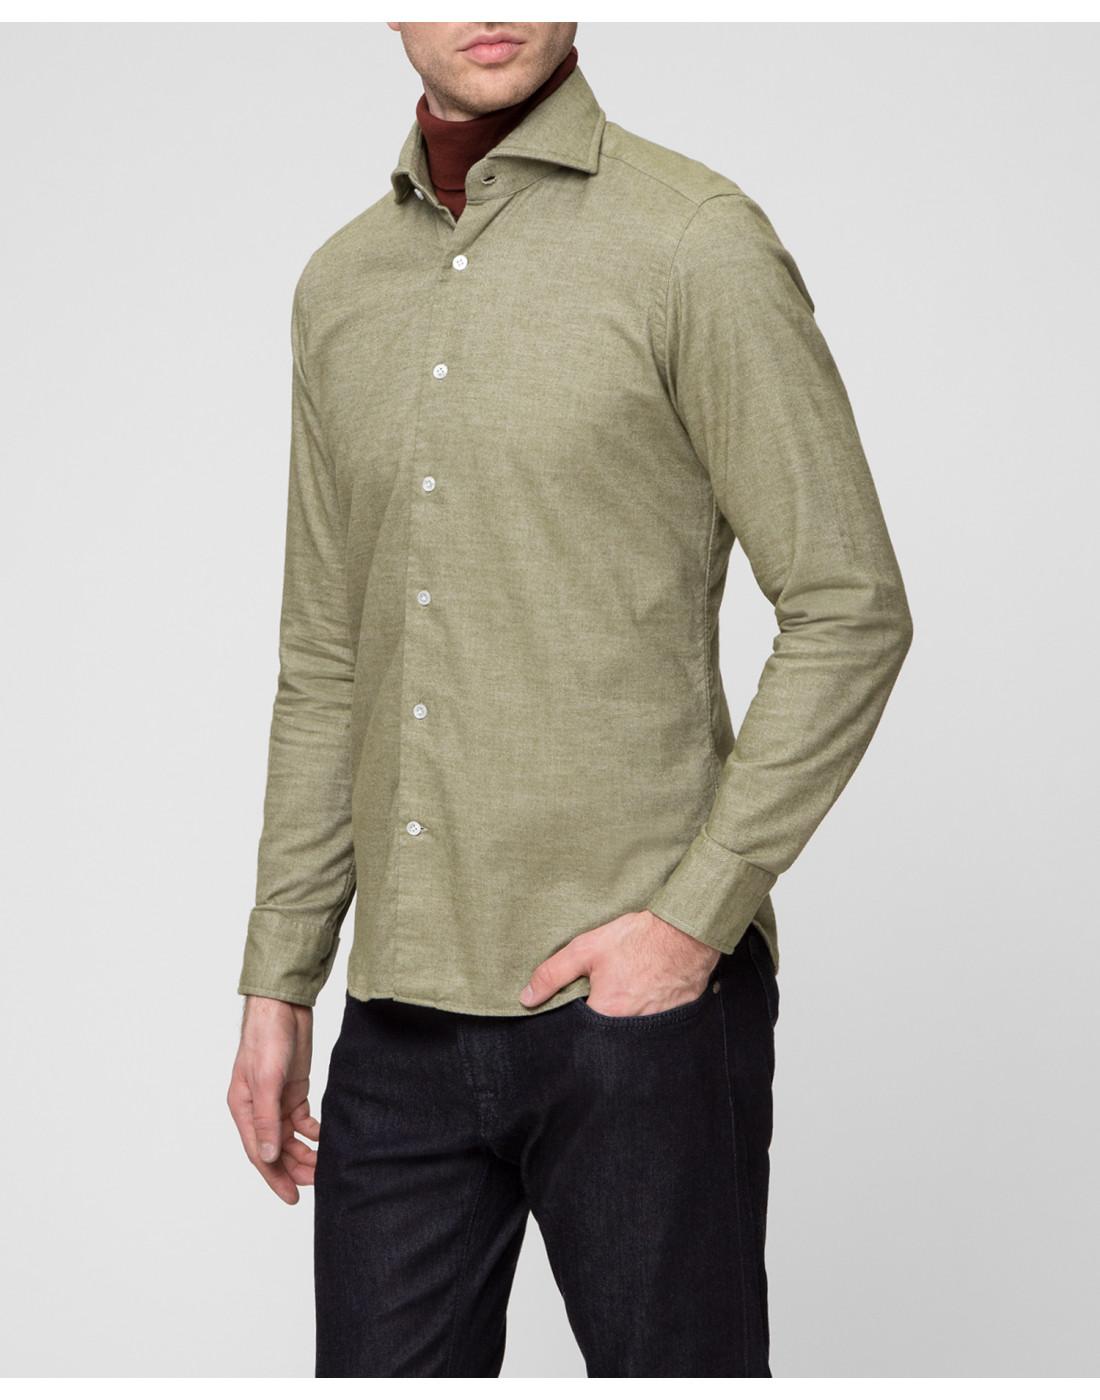 Мужская рубашка оливкового цвета Bagutta S08408.060-3